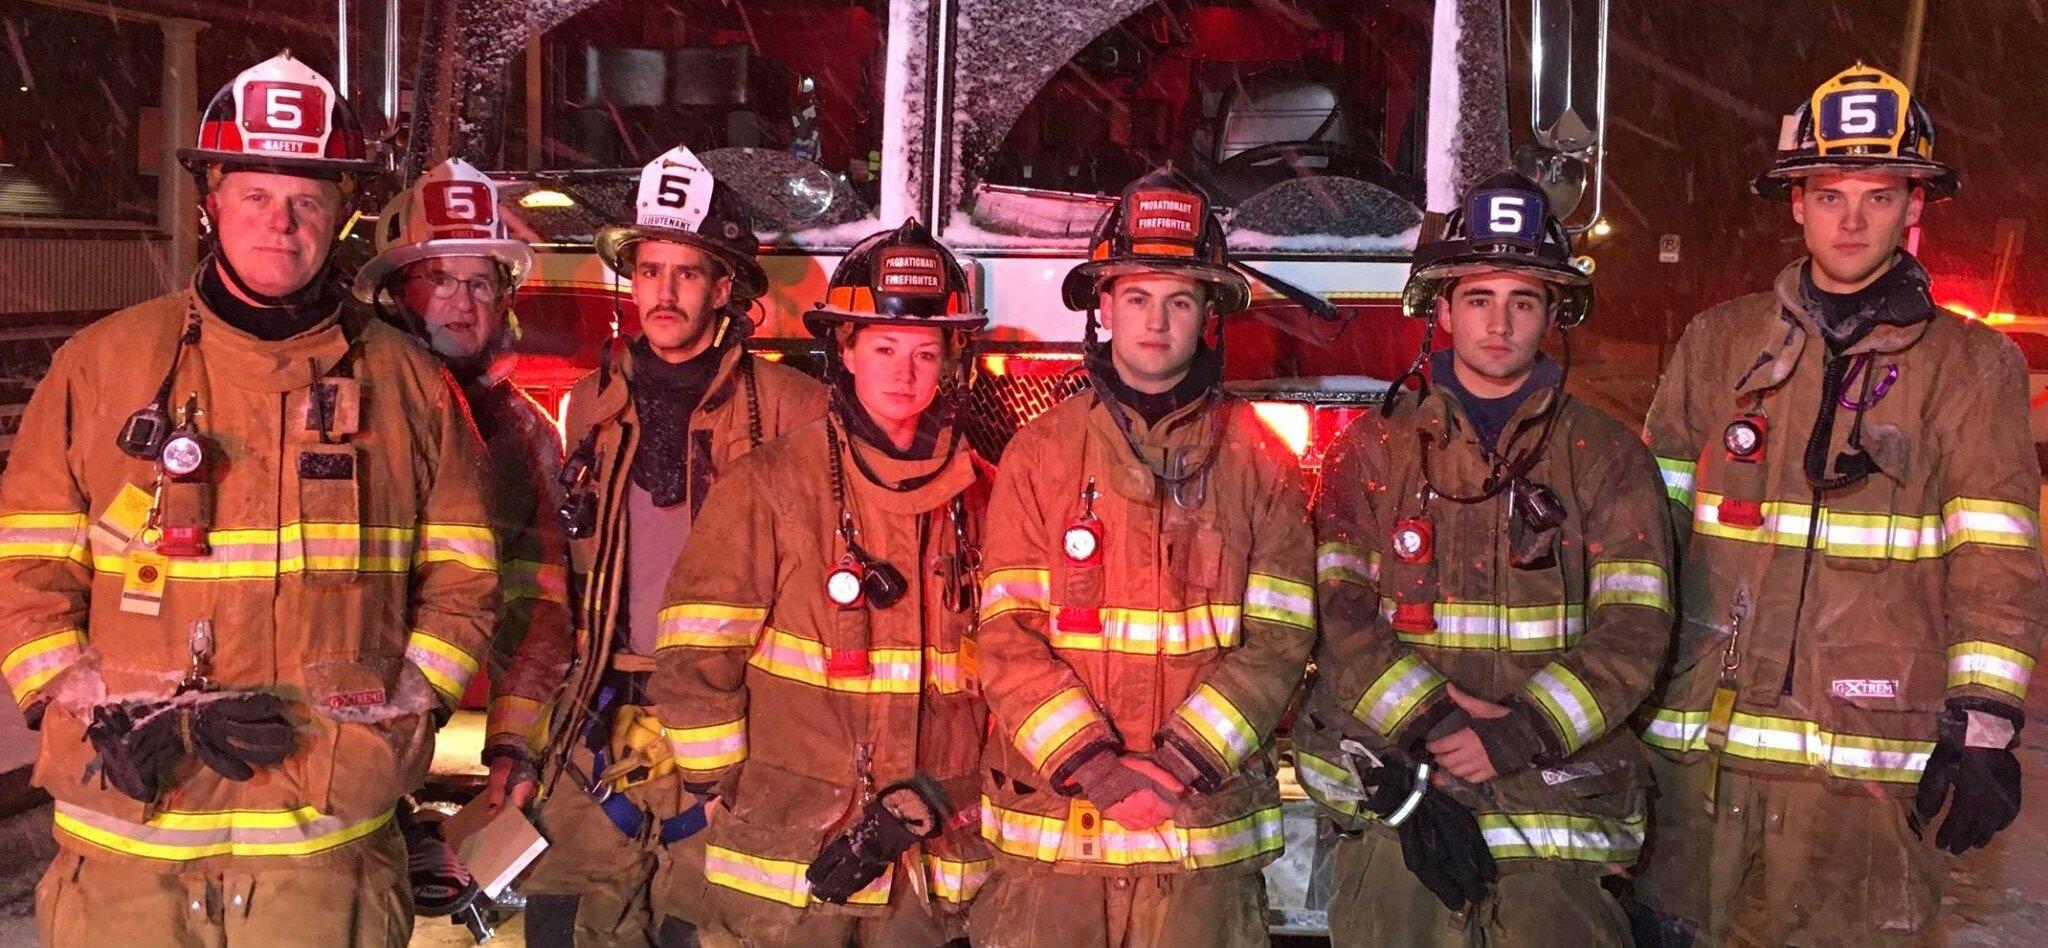 Courtesy: Alpha Fire Company, PA